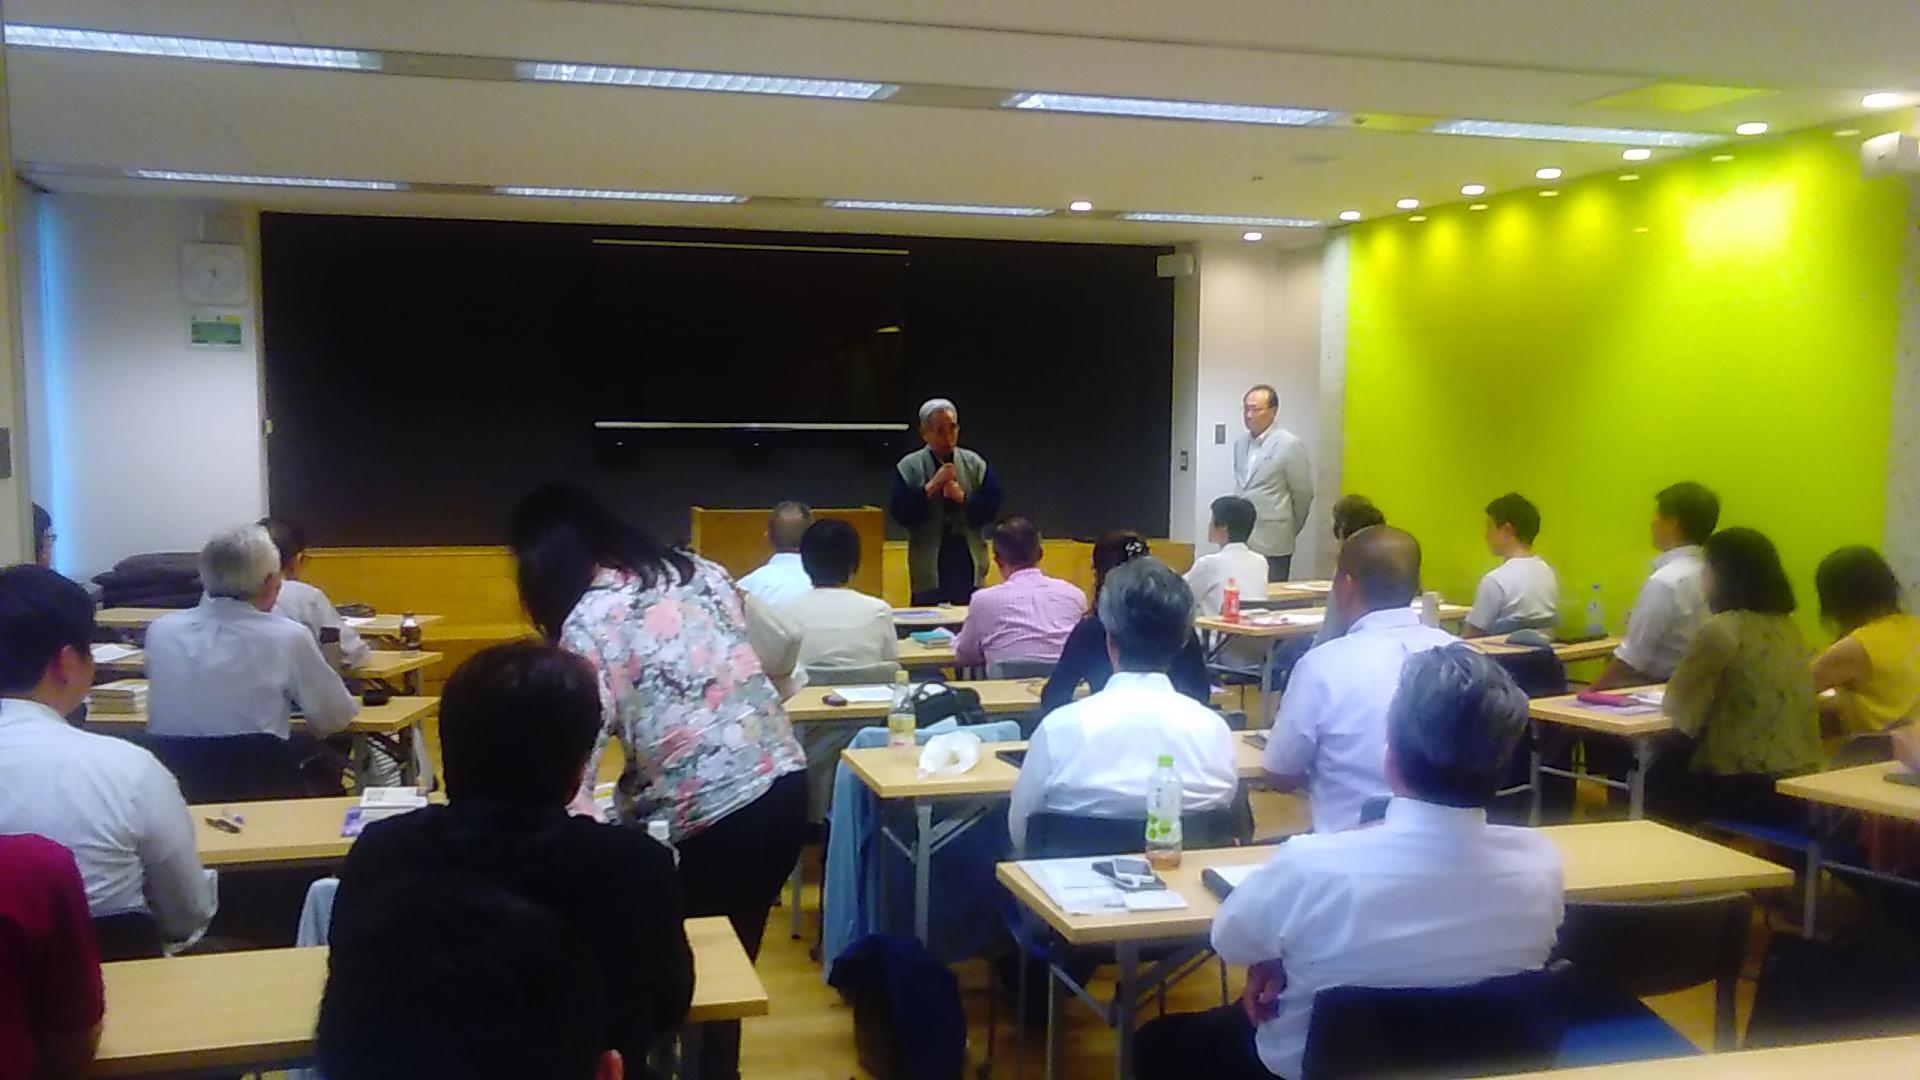 KIMG0822 - 思風会全国大会in広島